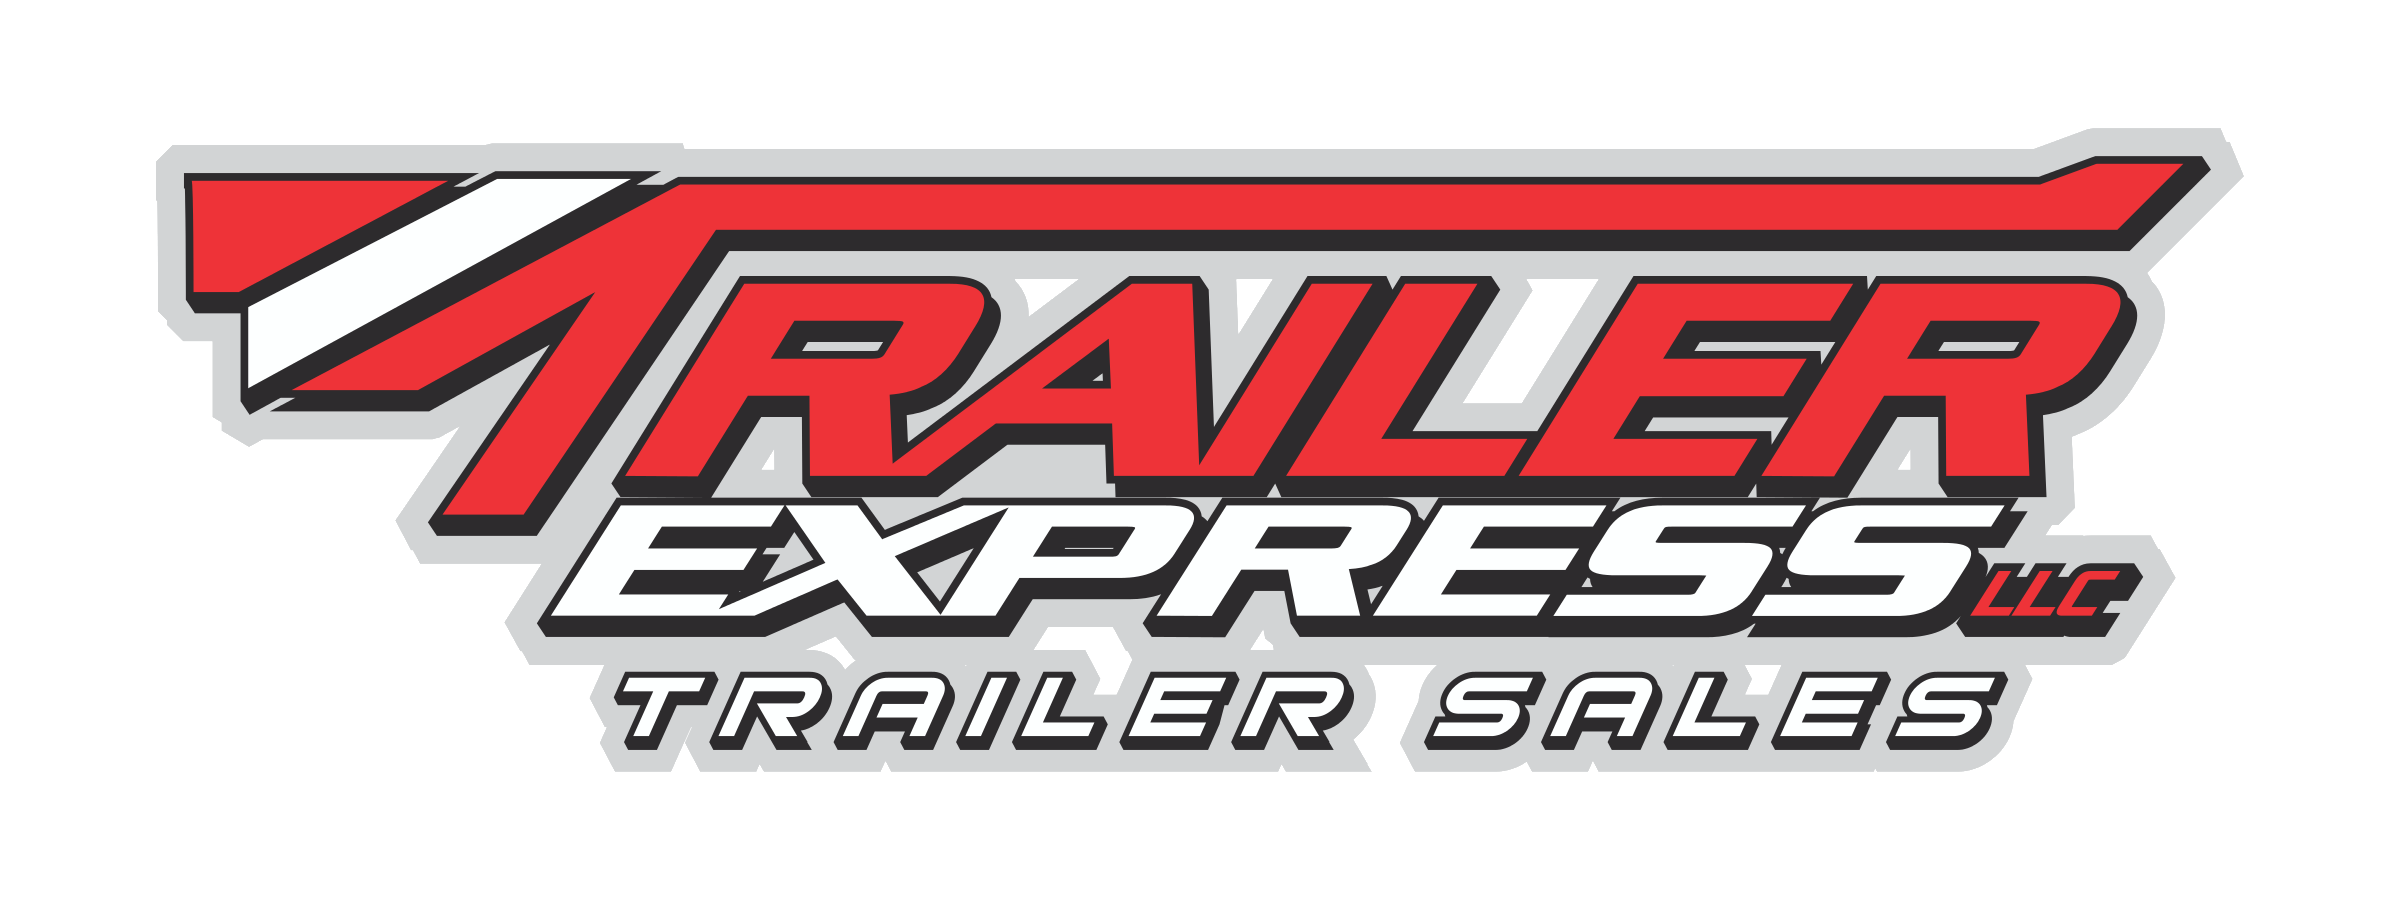 TRAILER EXPRESS logo